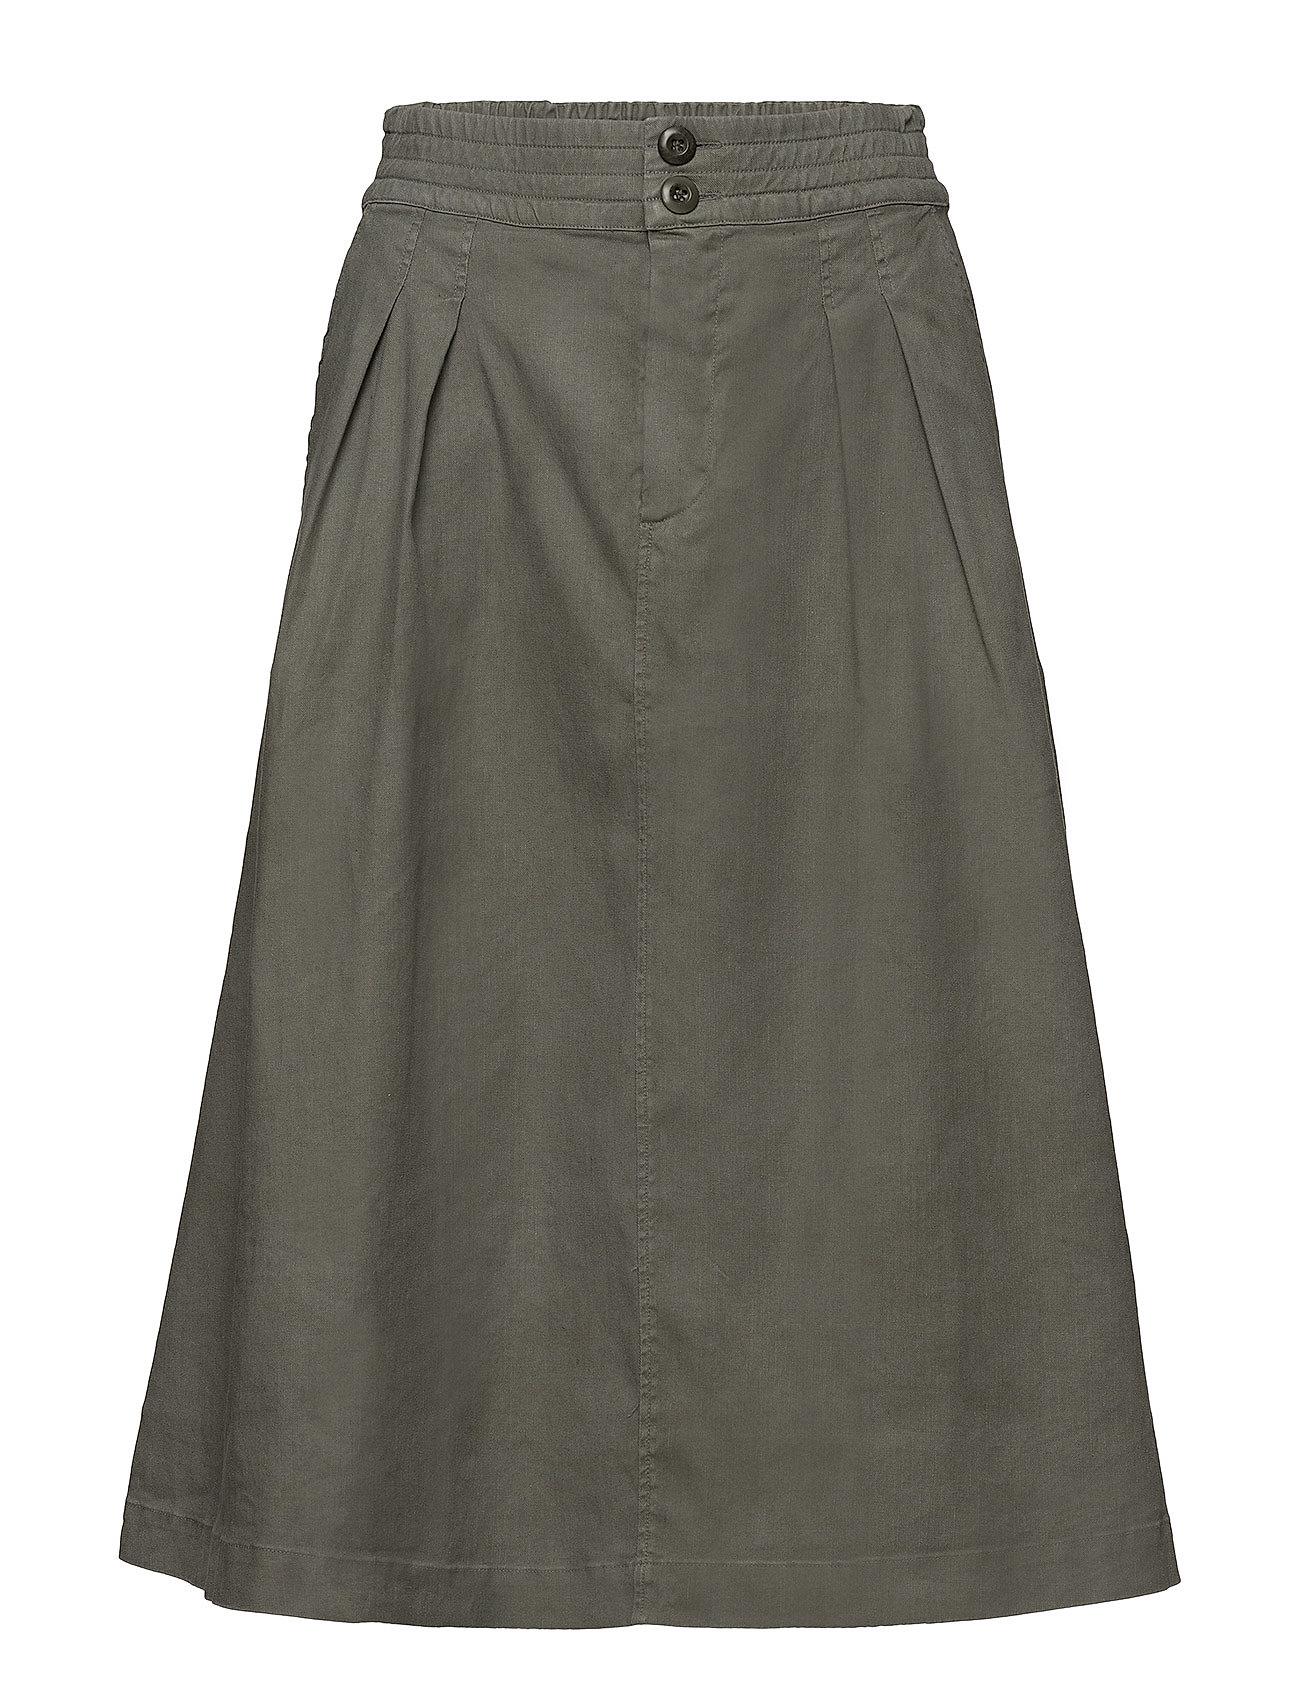 Filippa K Flared Pleat Skirt - SAGE